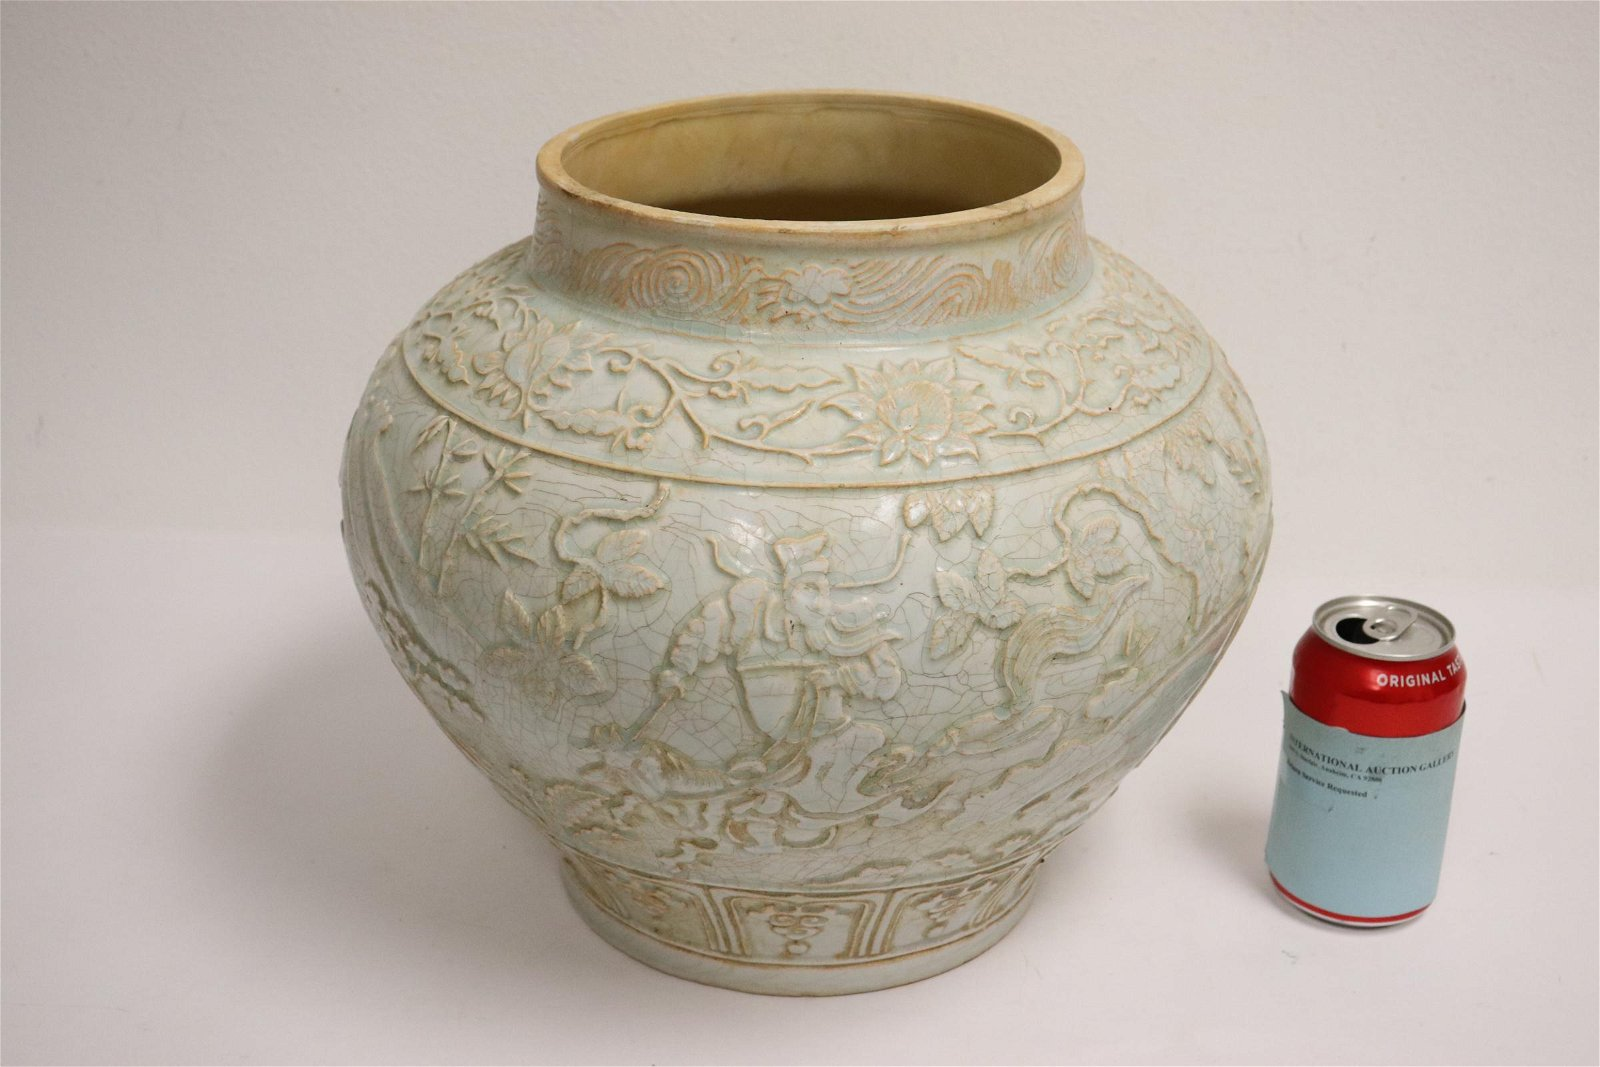 A large celadon porcelain jar